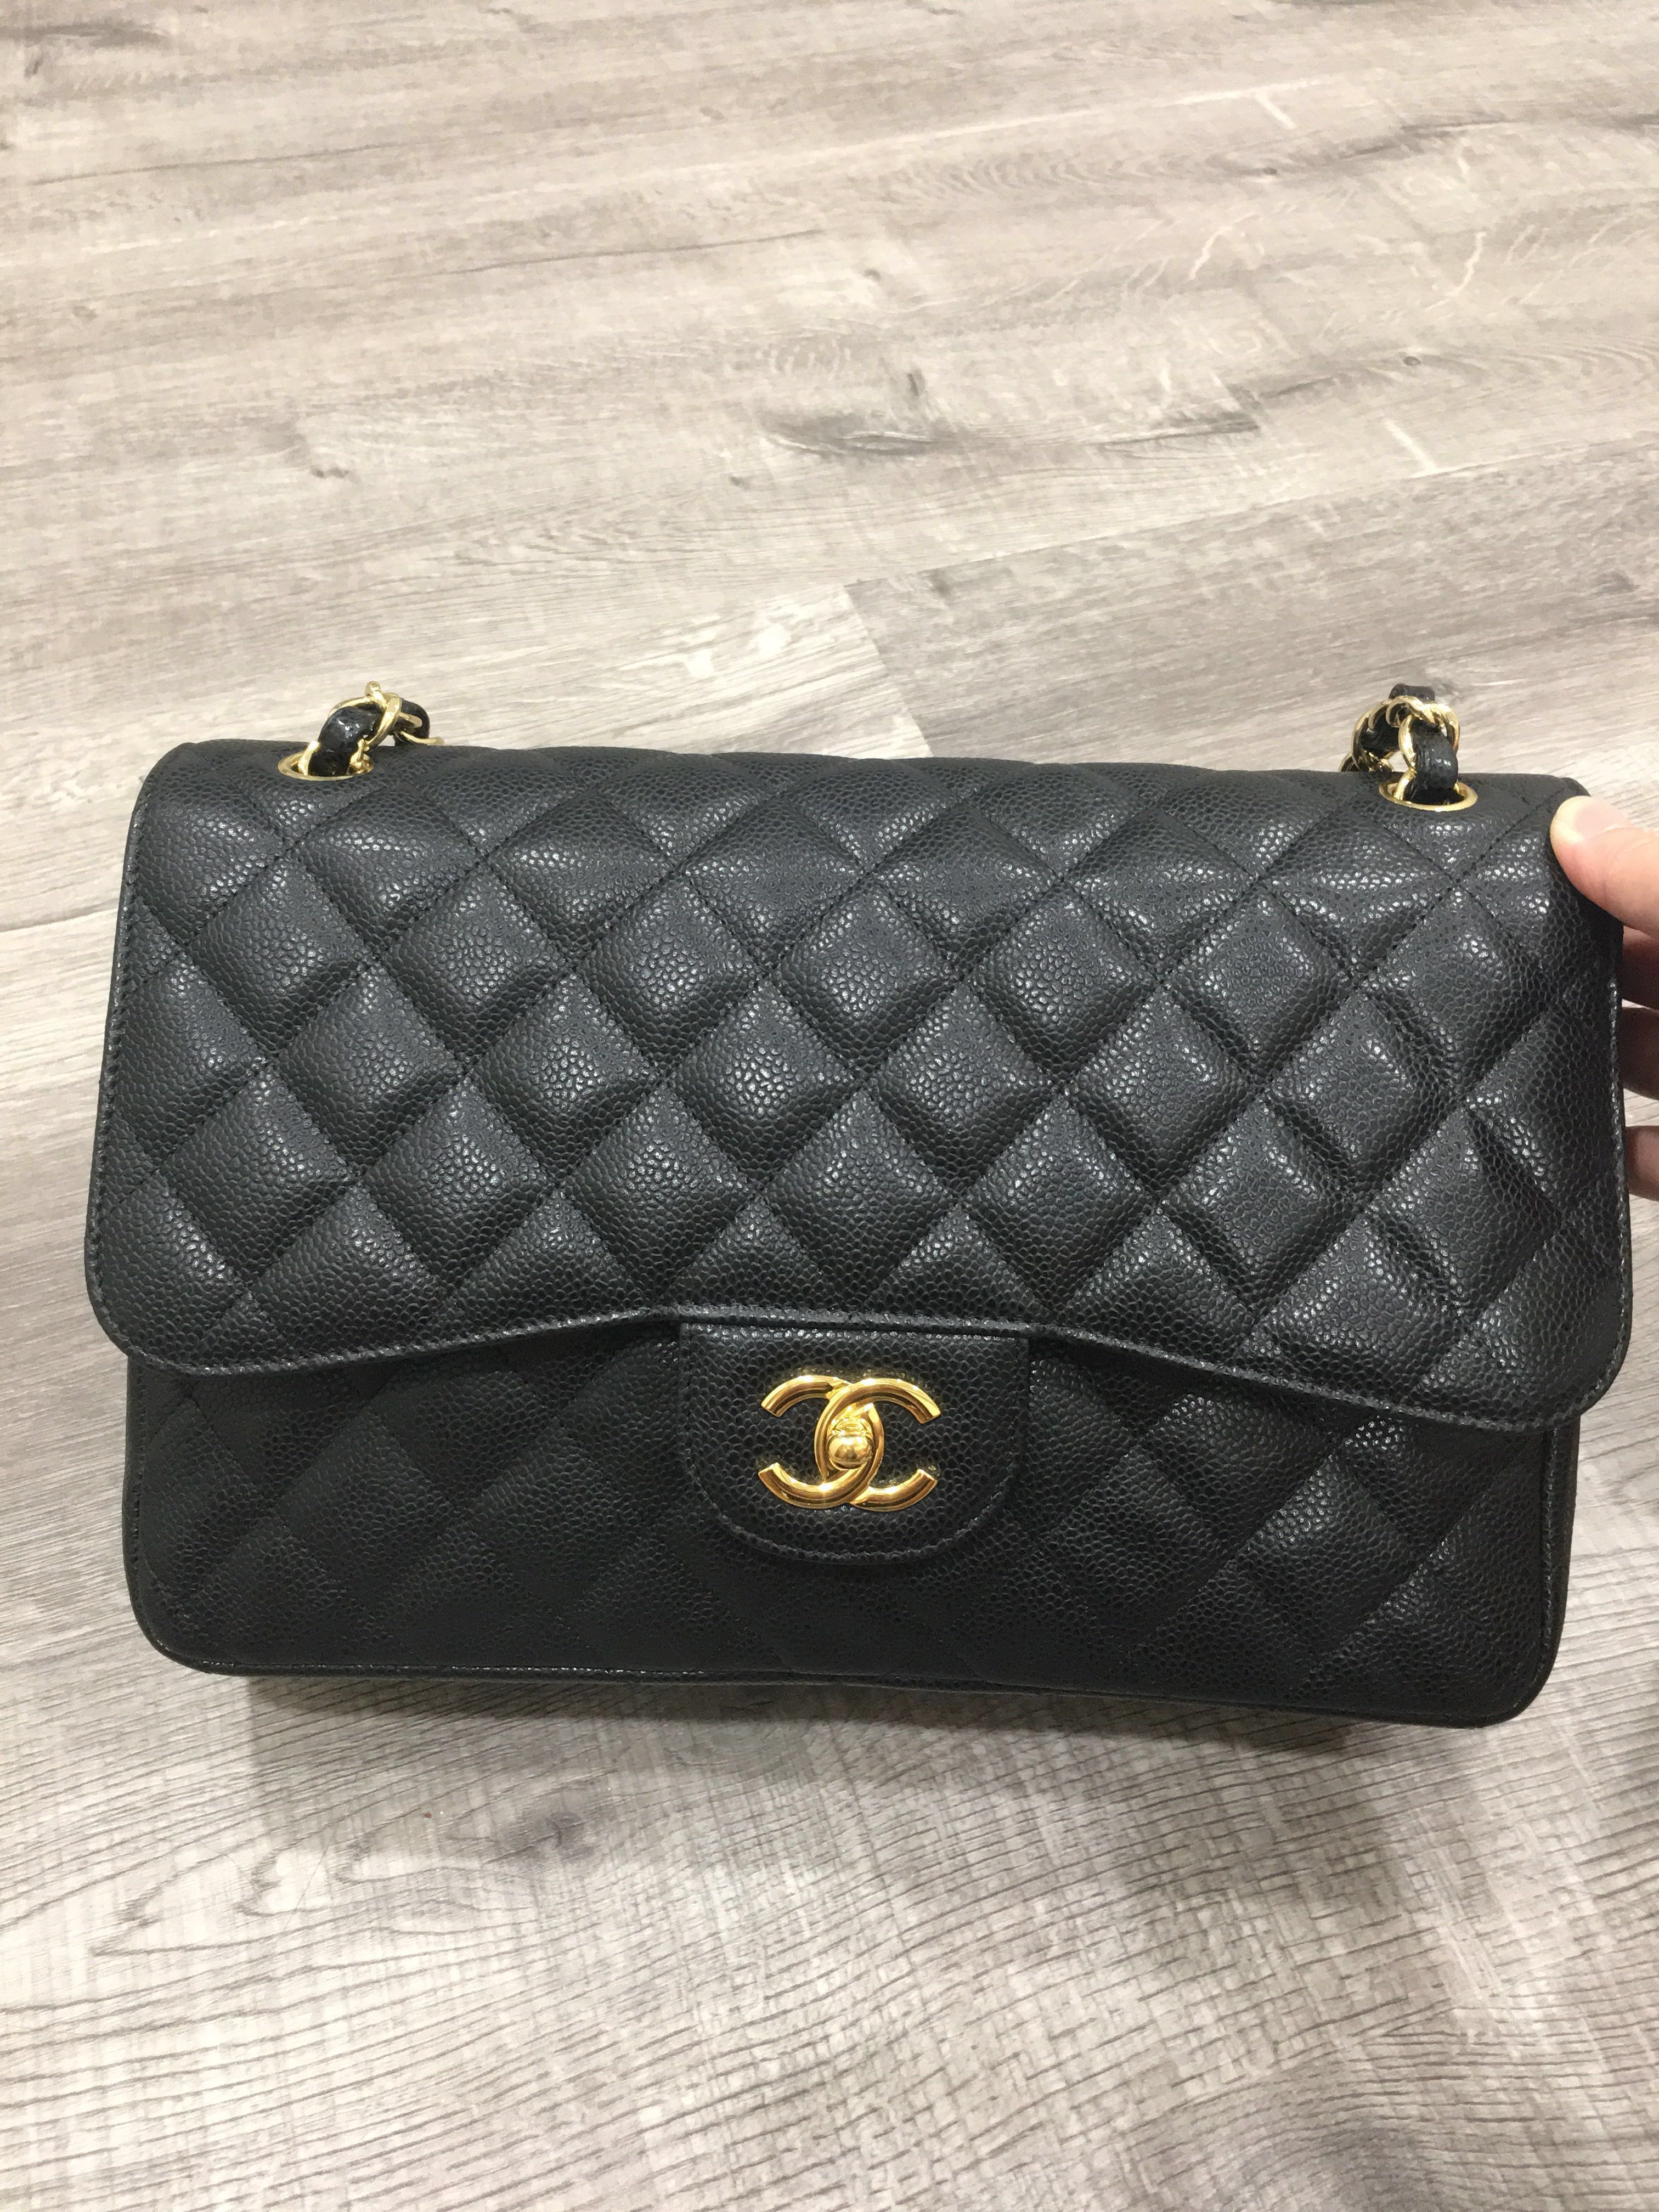 3520fb524 Chanel Classic Jumbo Flap Bag DD4400, Women's Fashion, Bags ...